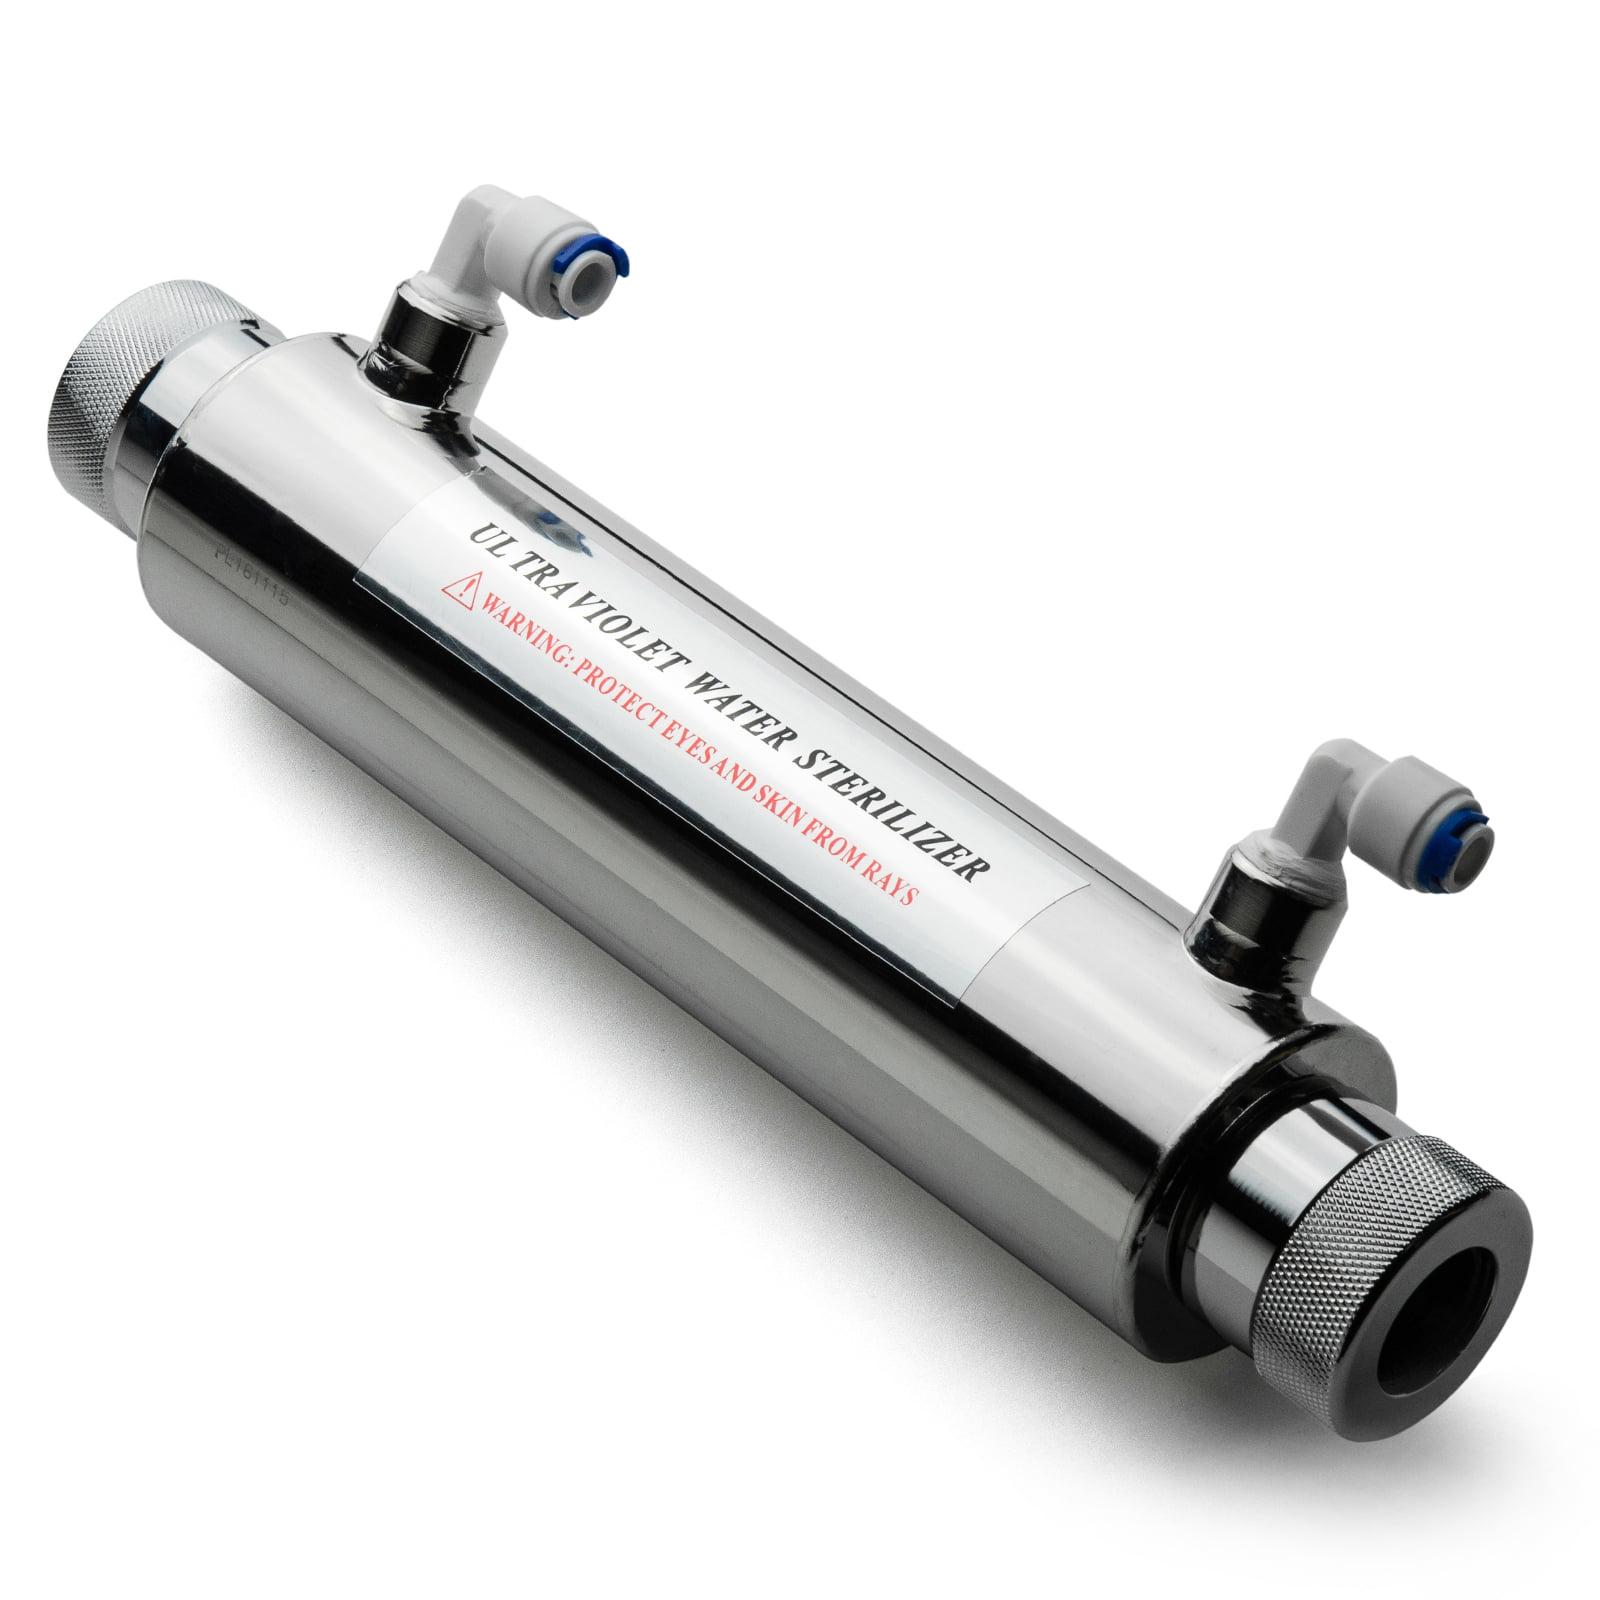 iSpring #UVF11A 11W 10 inch Ultra Violet UV Sterilizer with Smart Flow Control Switch 110V